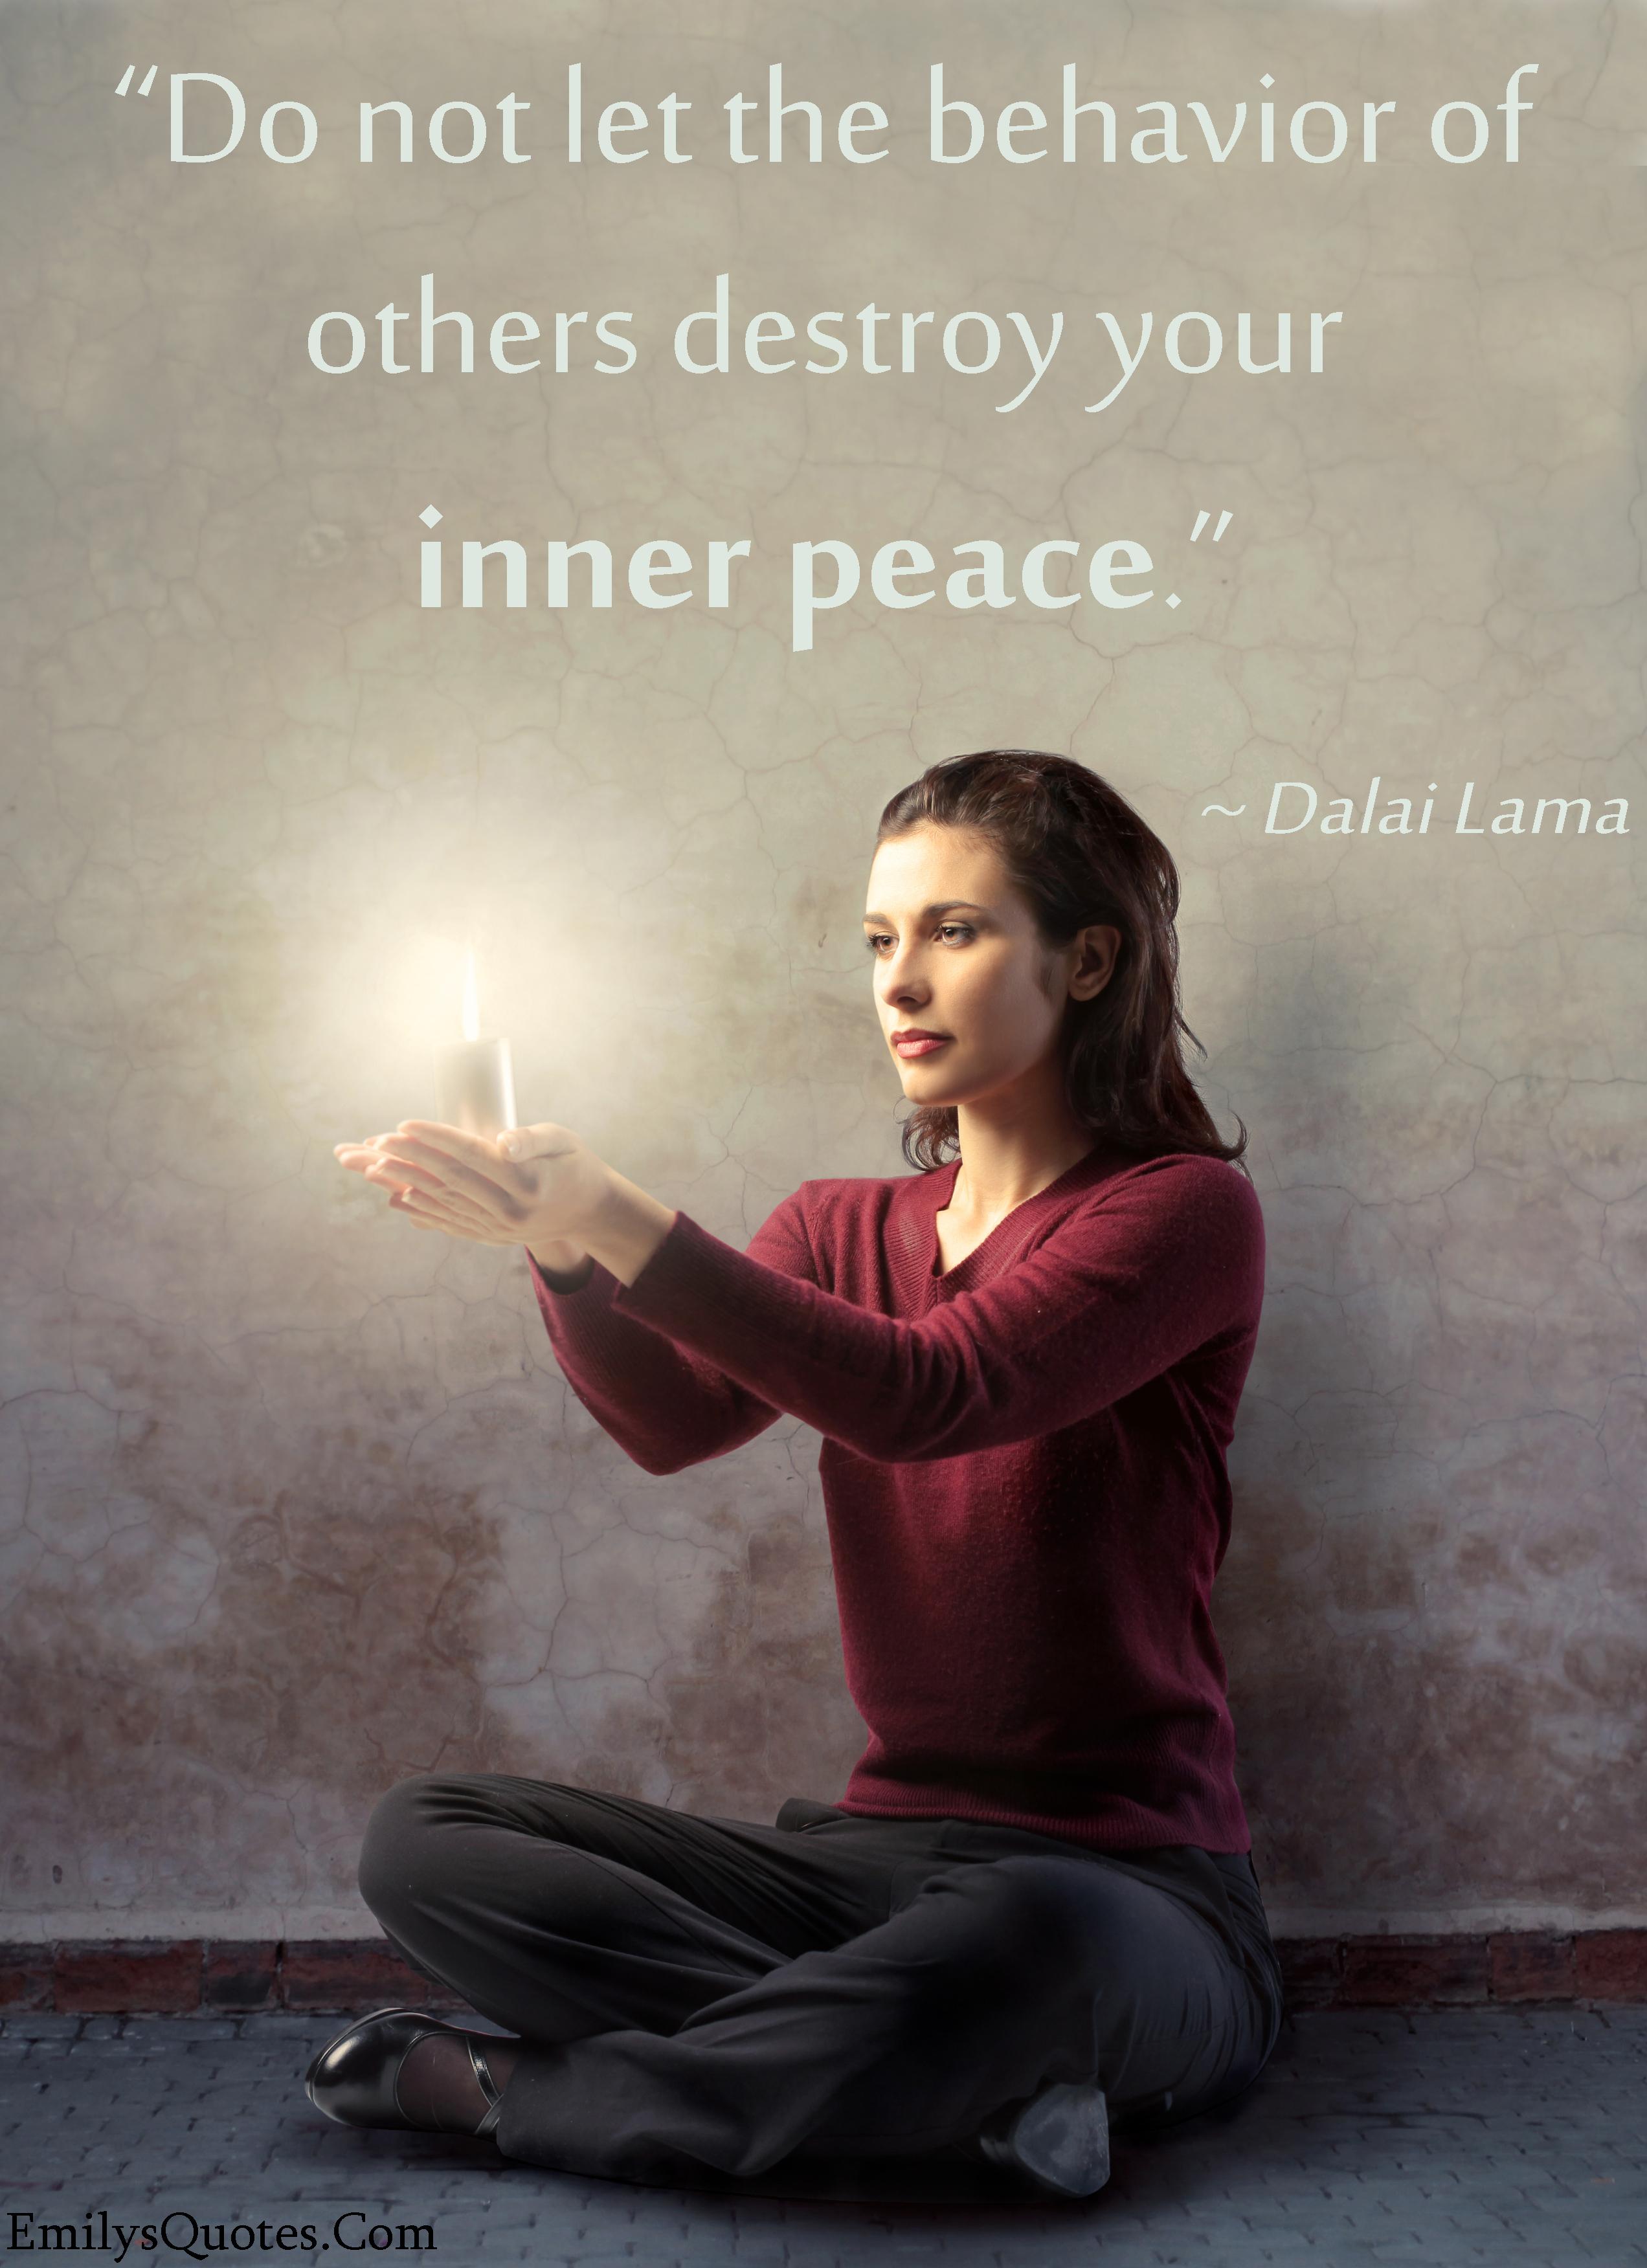 EmilysQuotes.Com - relationship, peace, encouraging, inspirational, Dalai Lama